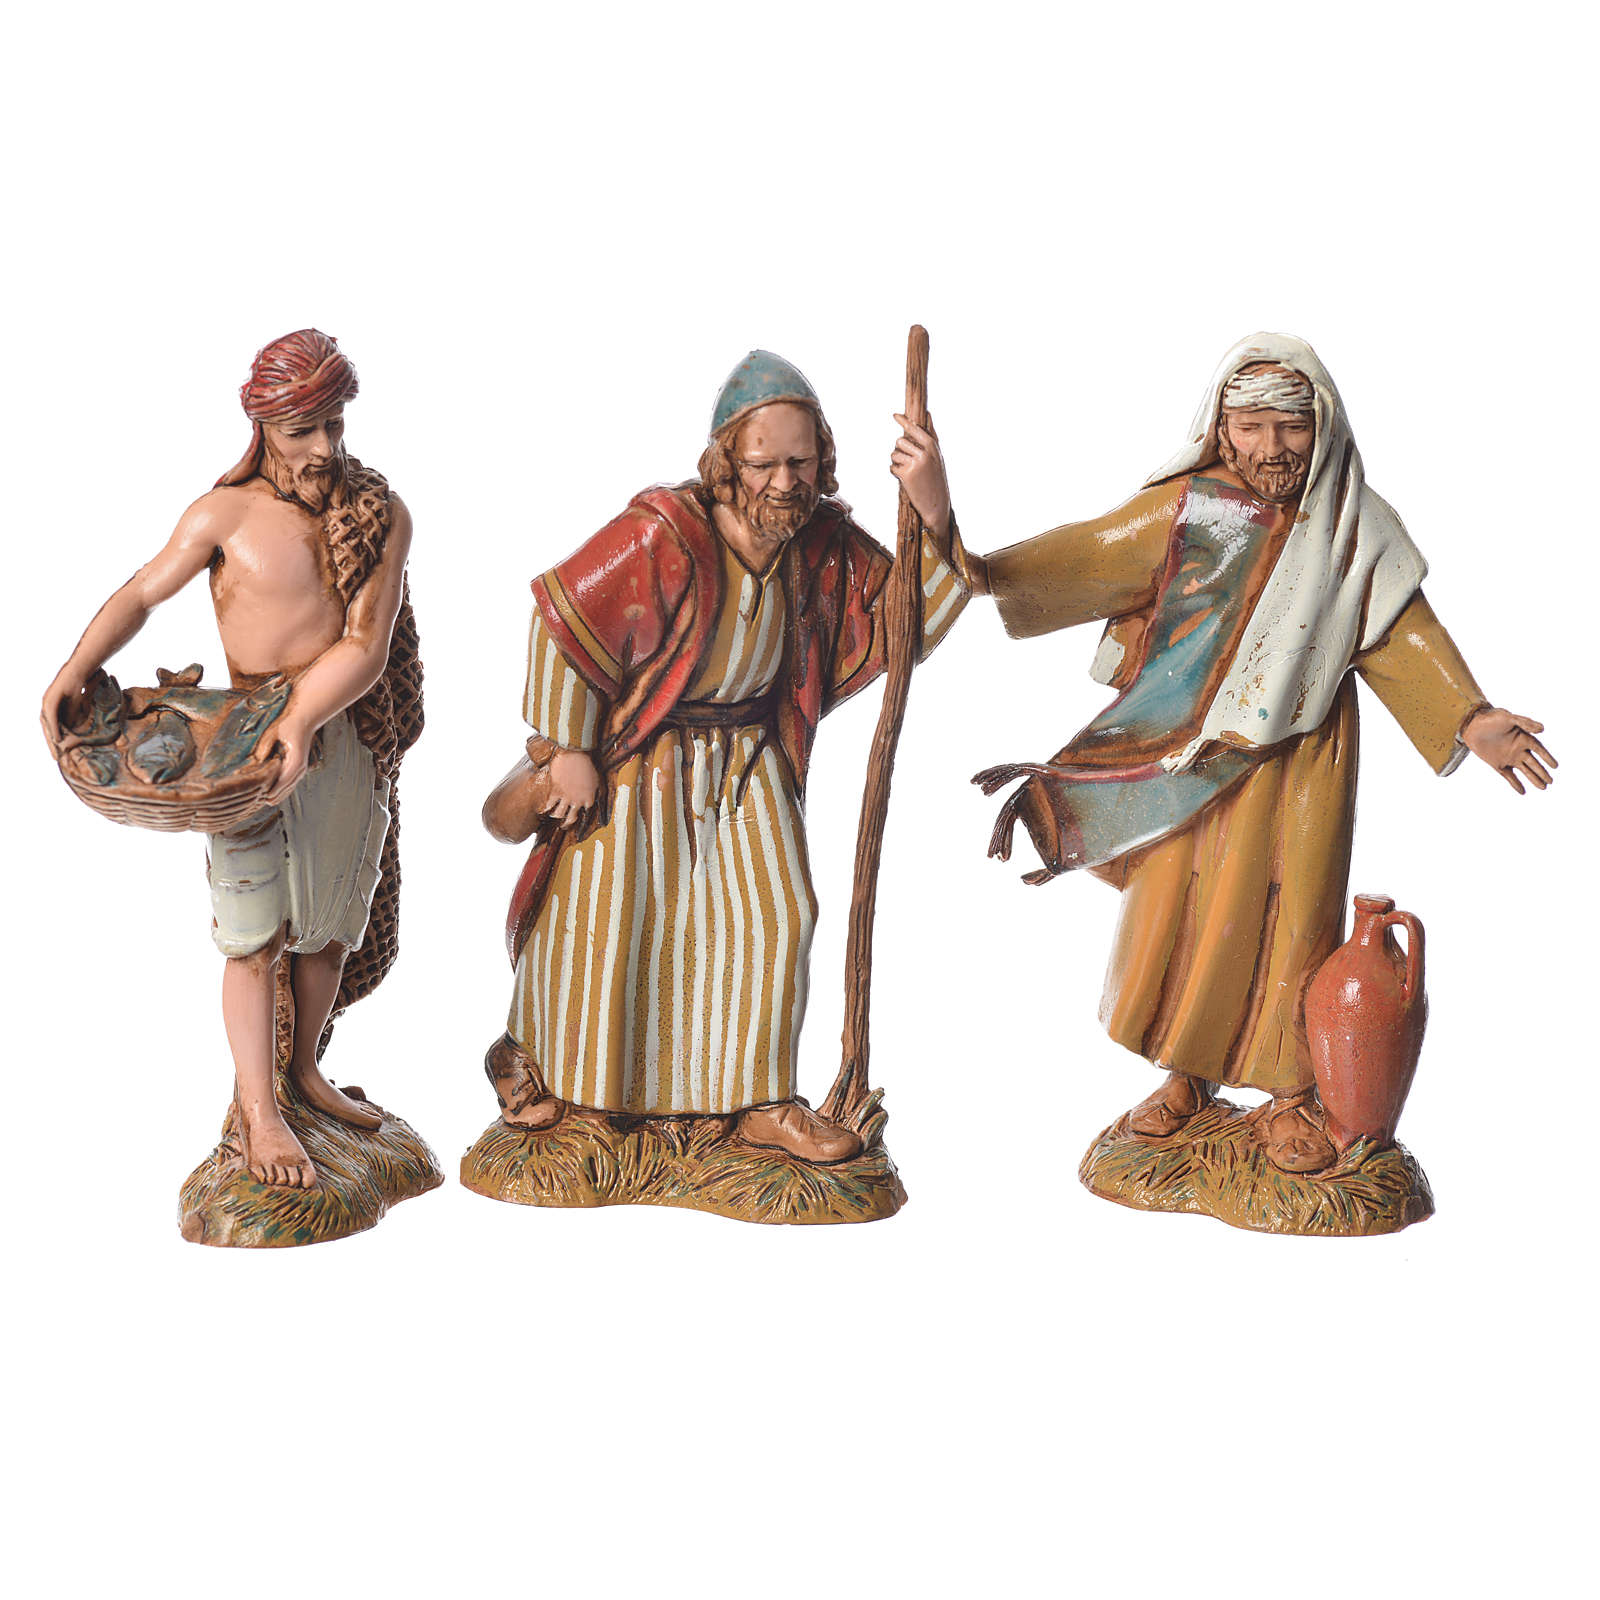 Pastori costumi storici 10 cm 8 pz Moranduzzo 4